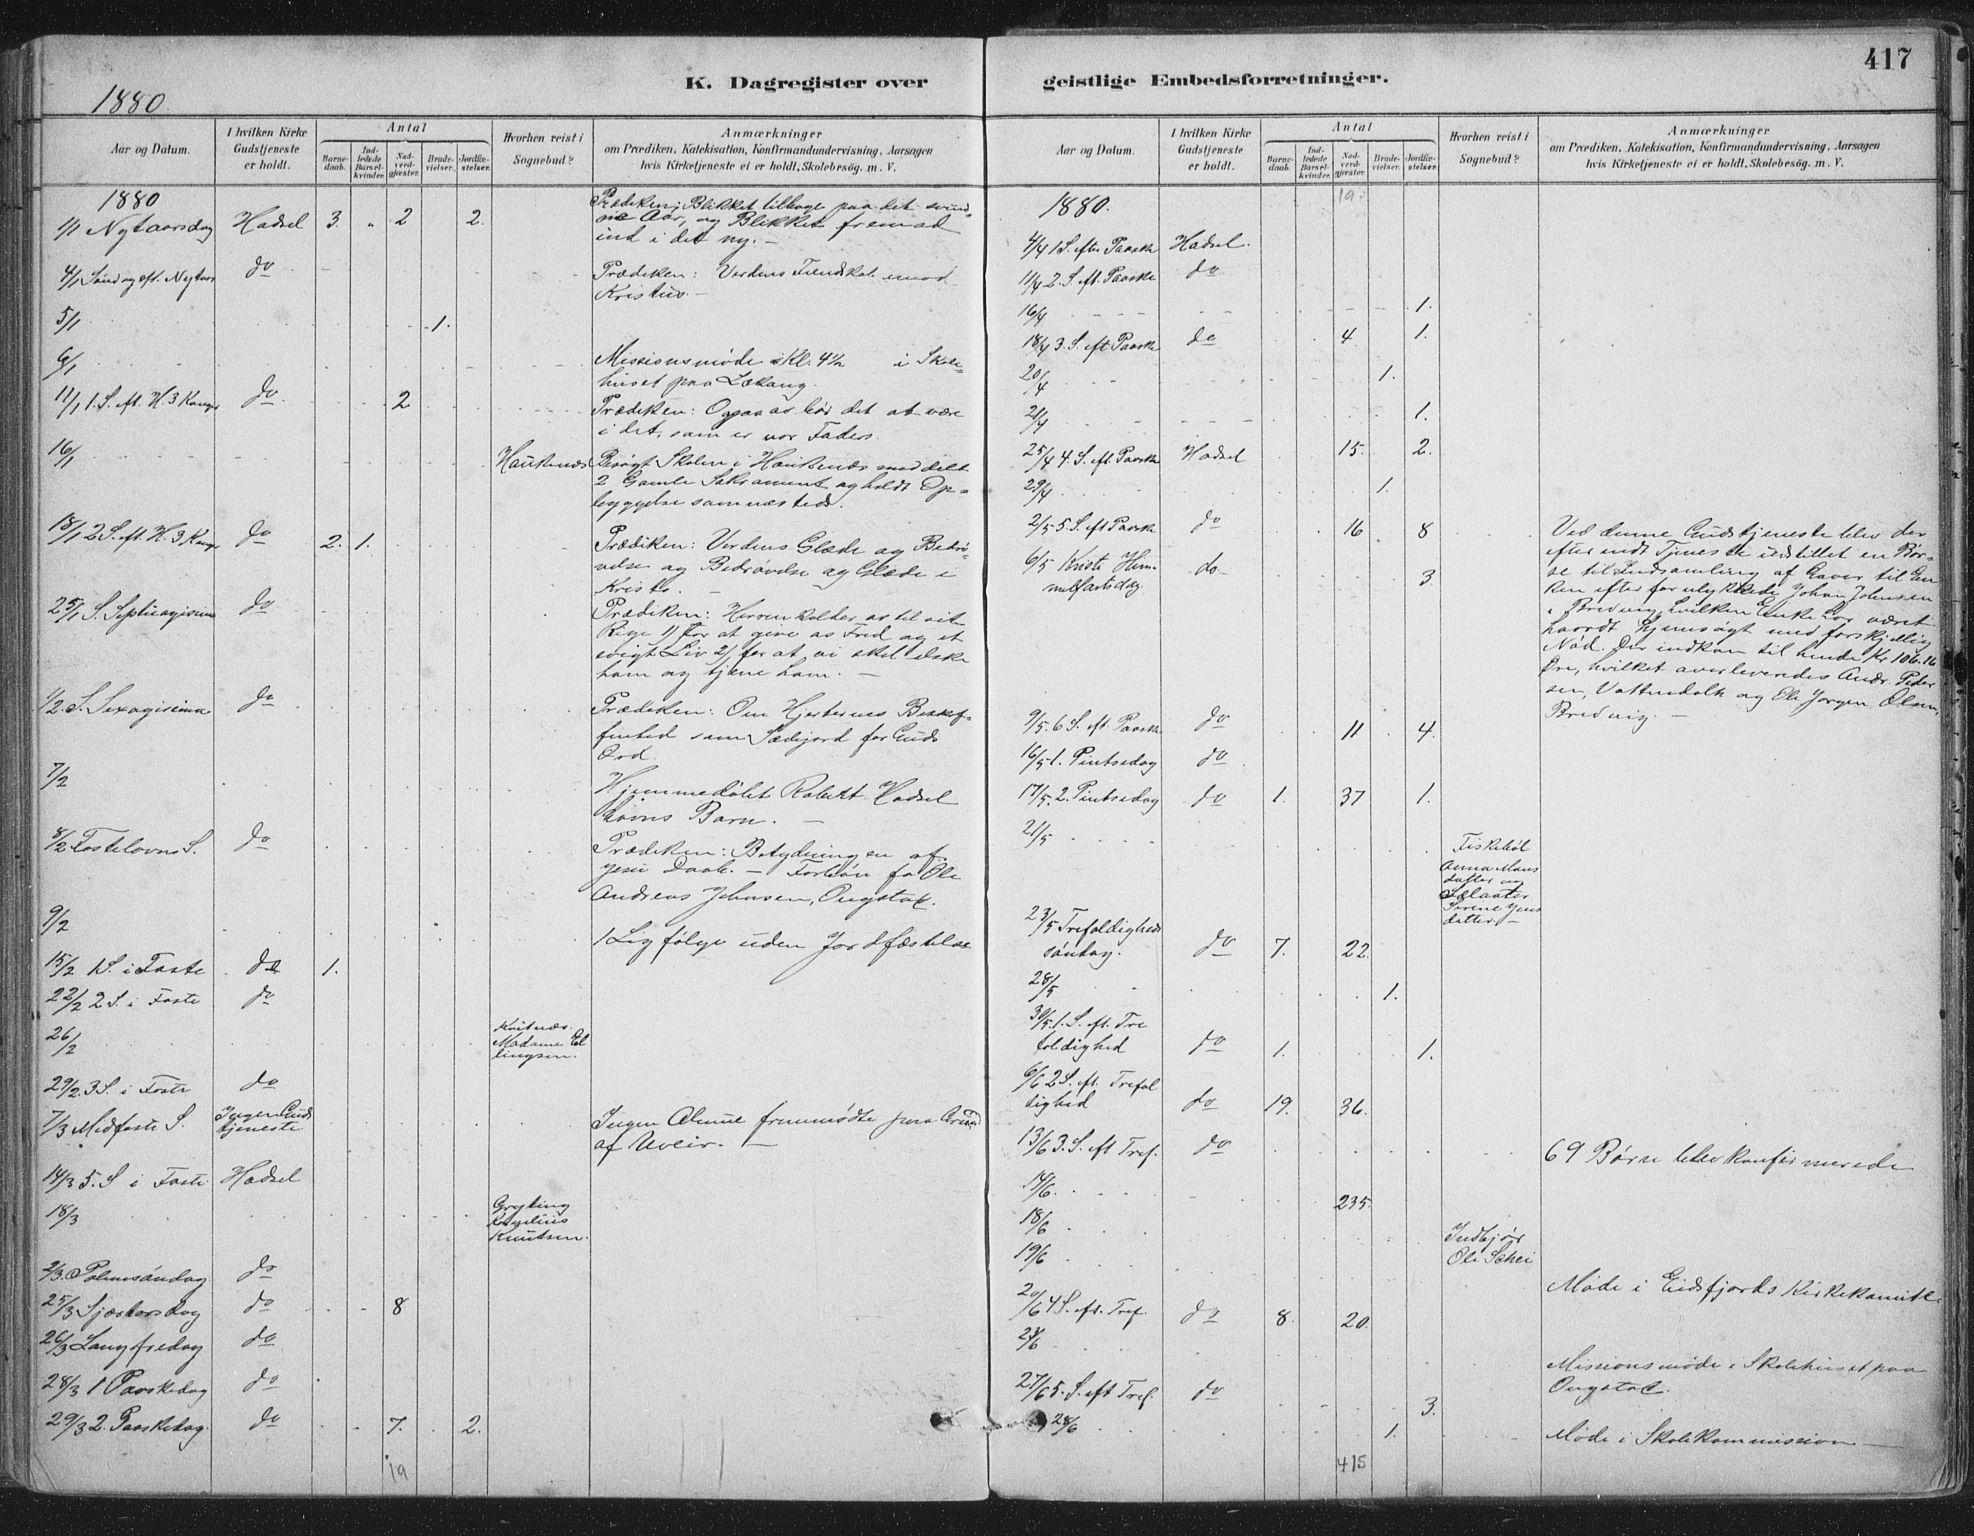 SAT, Ministerialprotokoller, klokkerbøker og fødselsregistre - Nordland, 888/L1244: Ministerialbok nr. 888A10, 1880-1890, s. 417